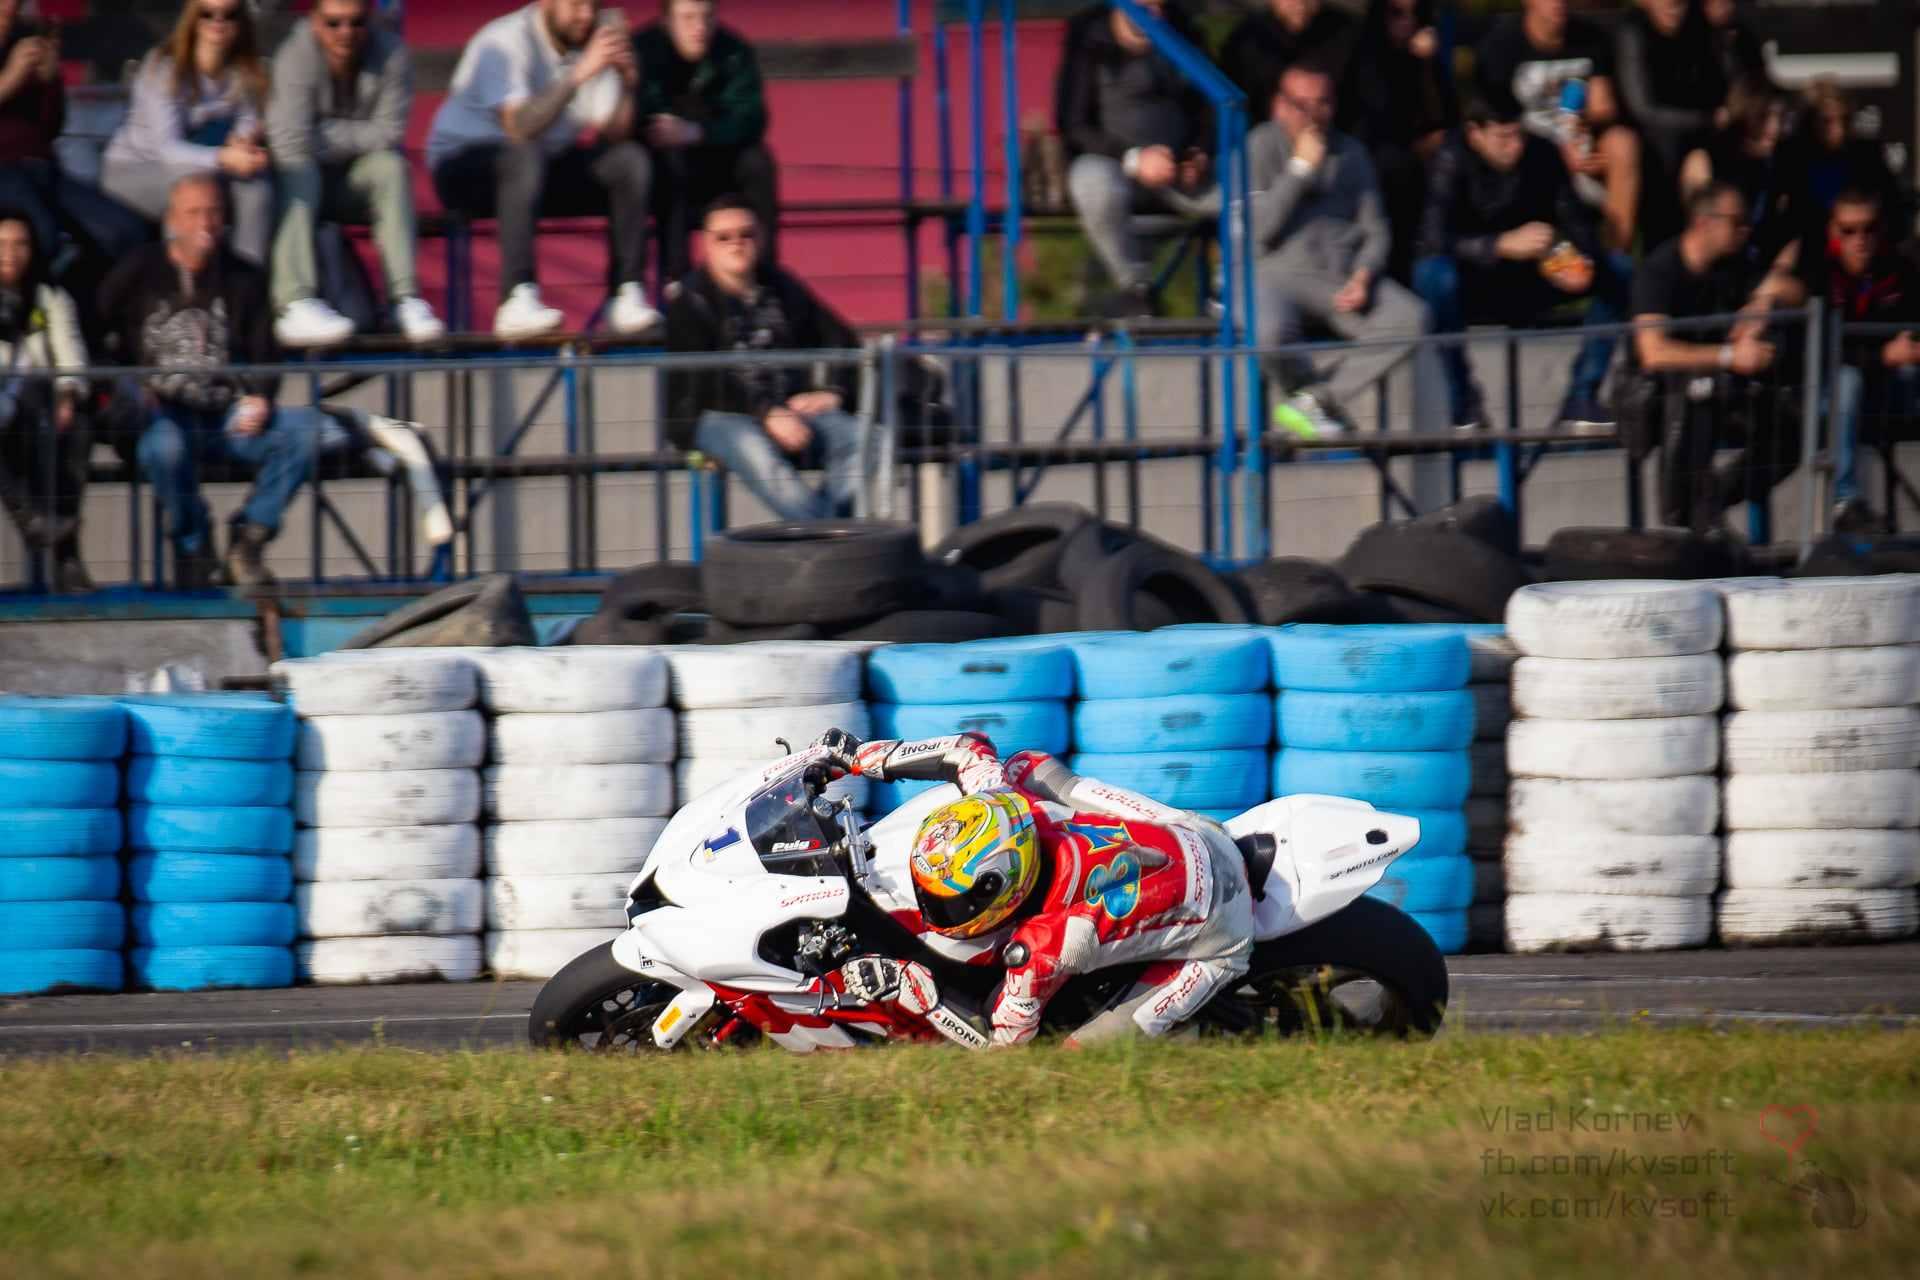 5-6_etap_MotoGPUkraine_082